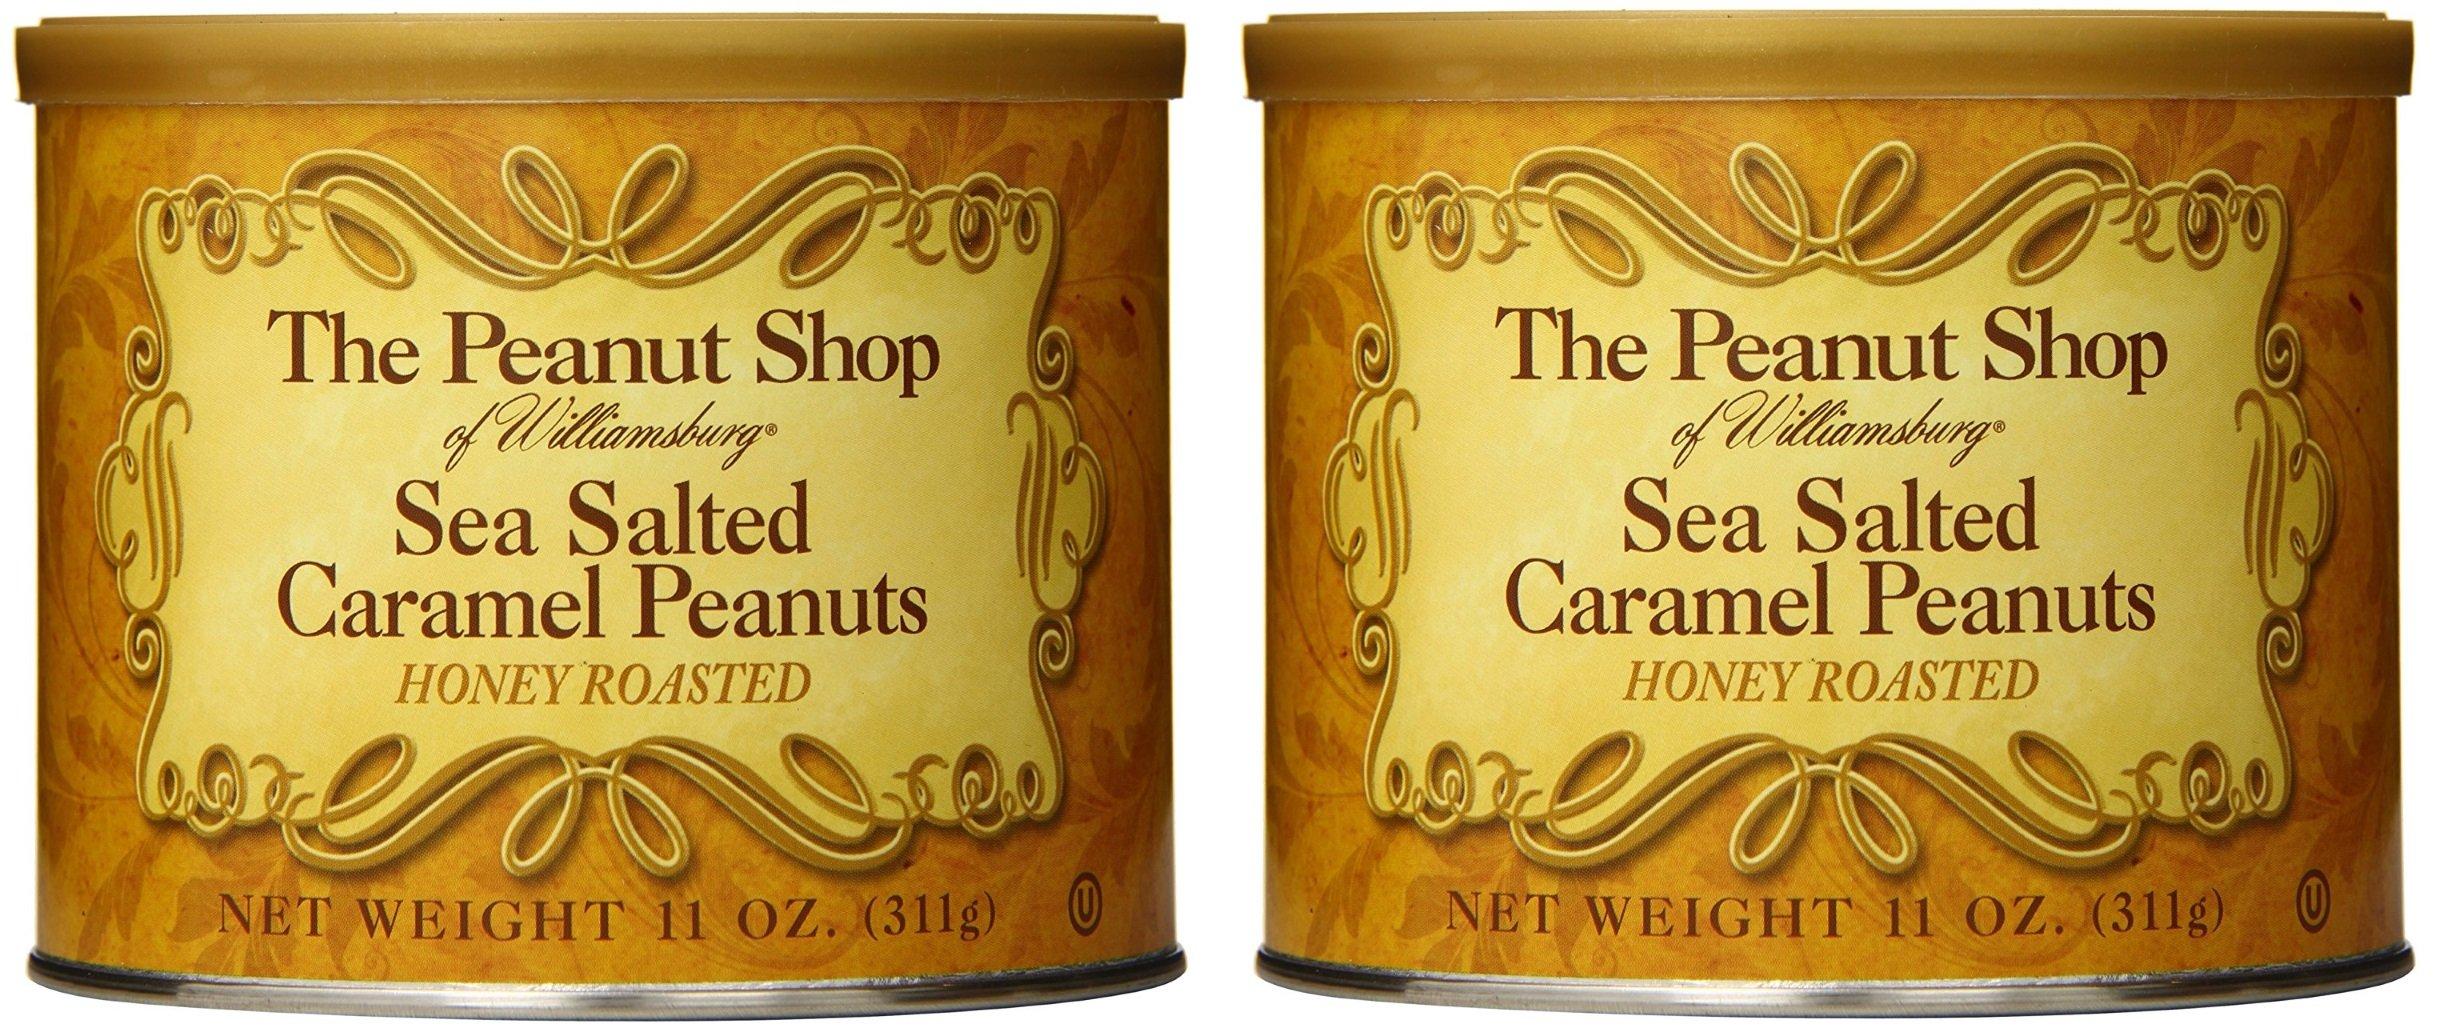 The Peanut Shop of Williamsburg Honey Roasted Sea Salted Caramel Peanuts - 11 Oz. Tin (Pack of 2)